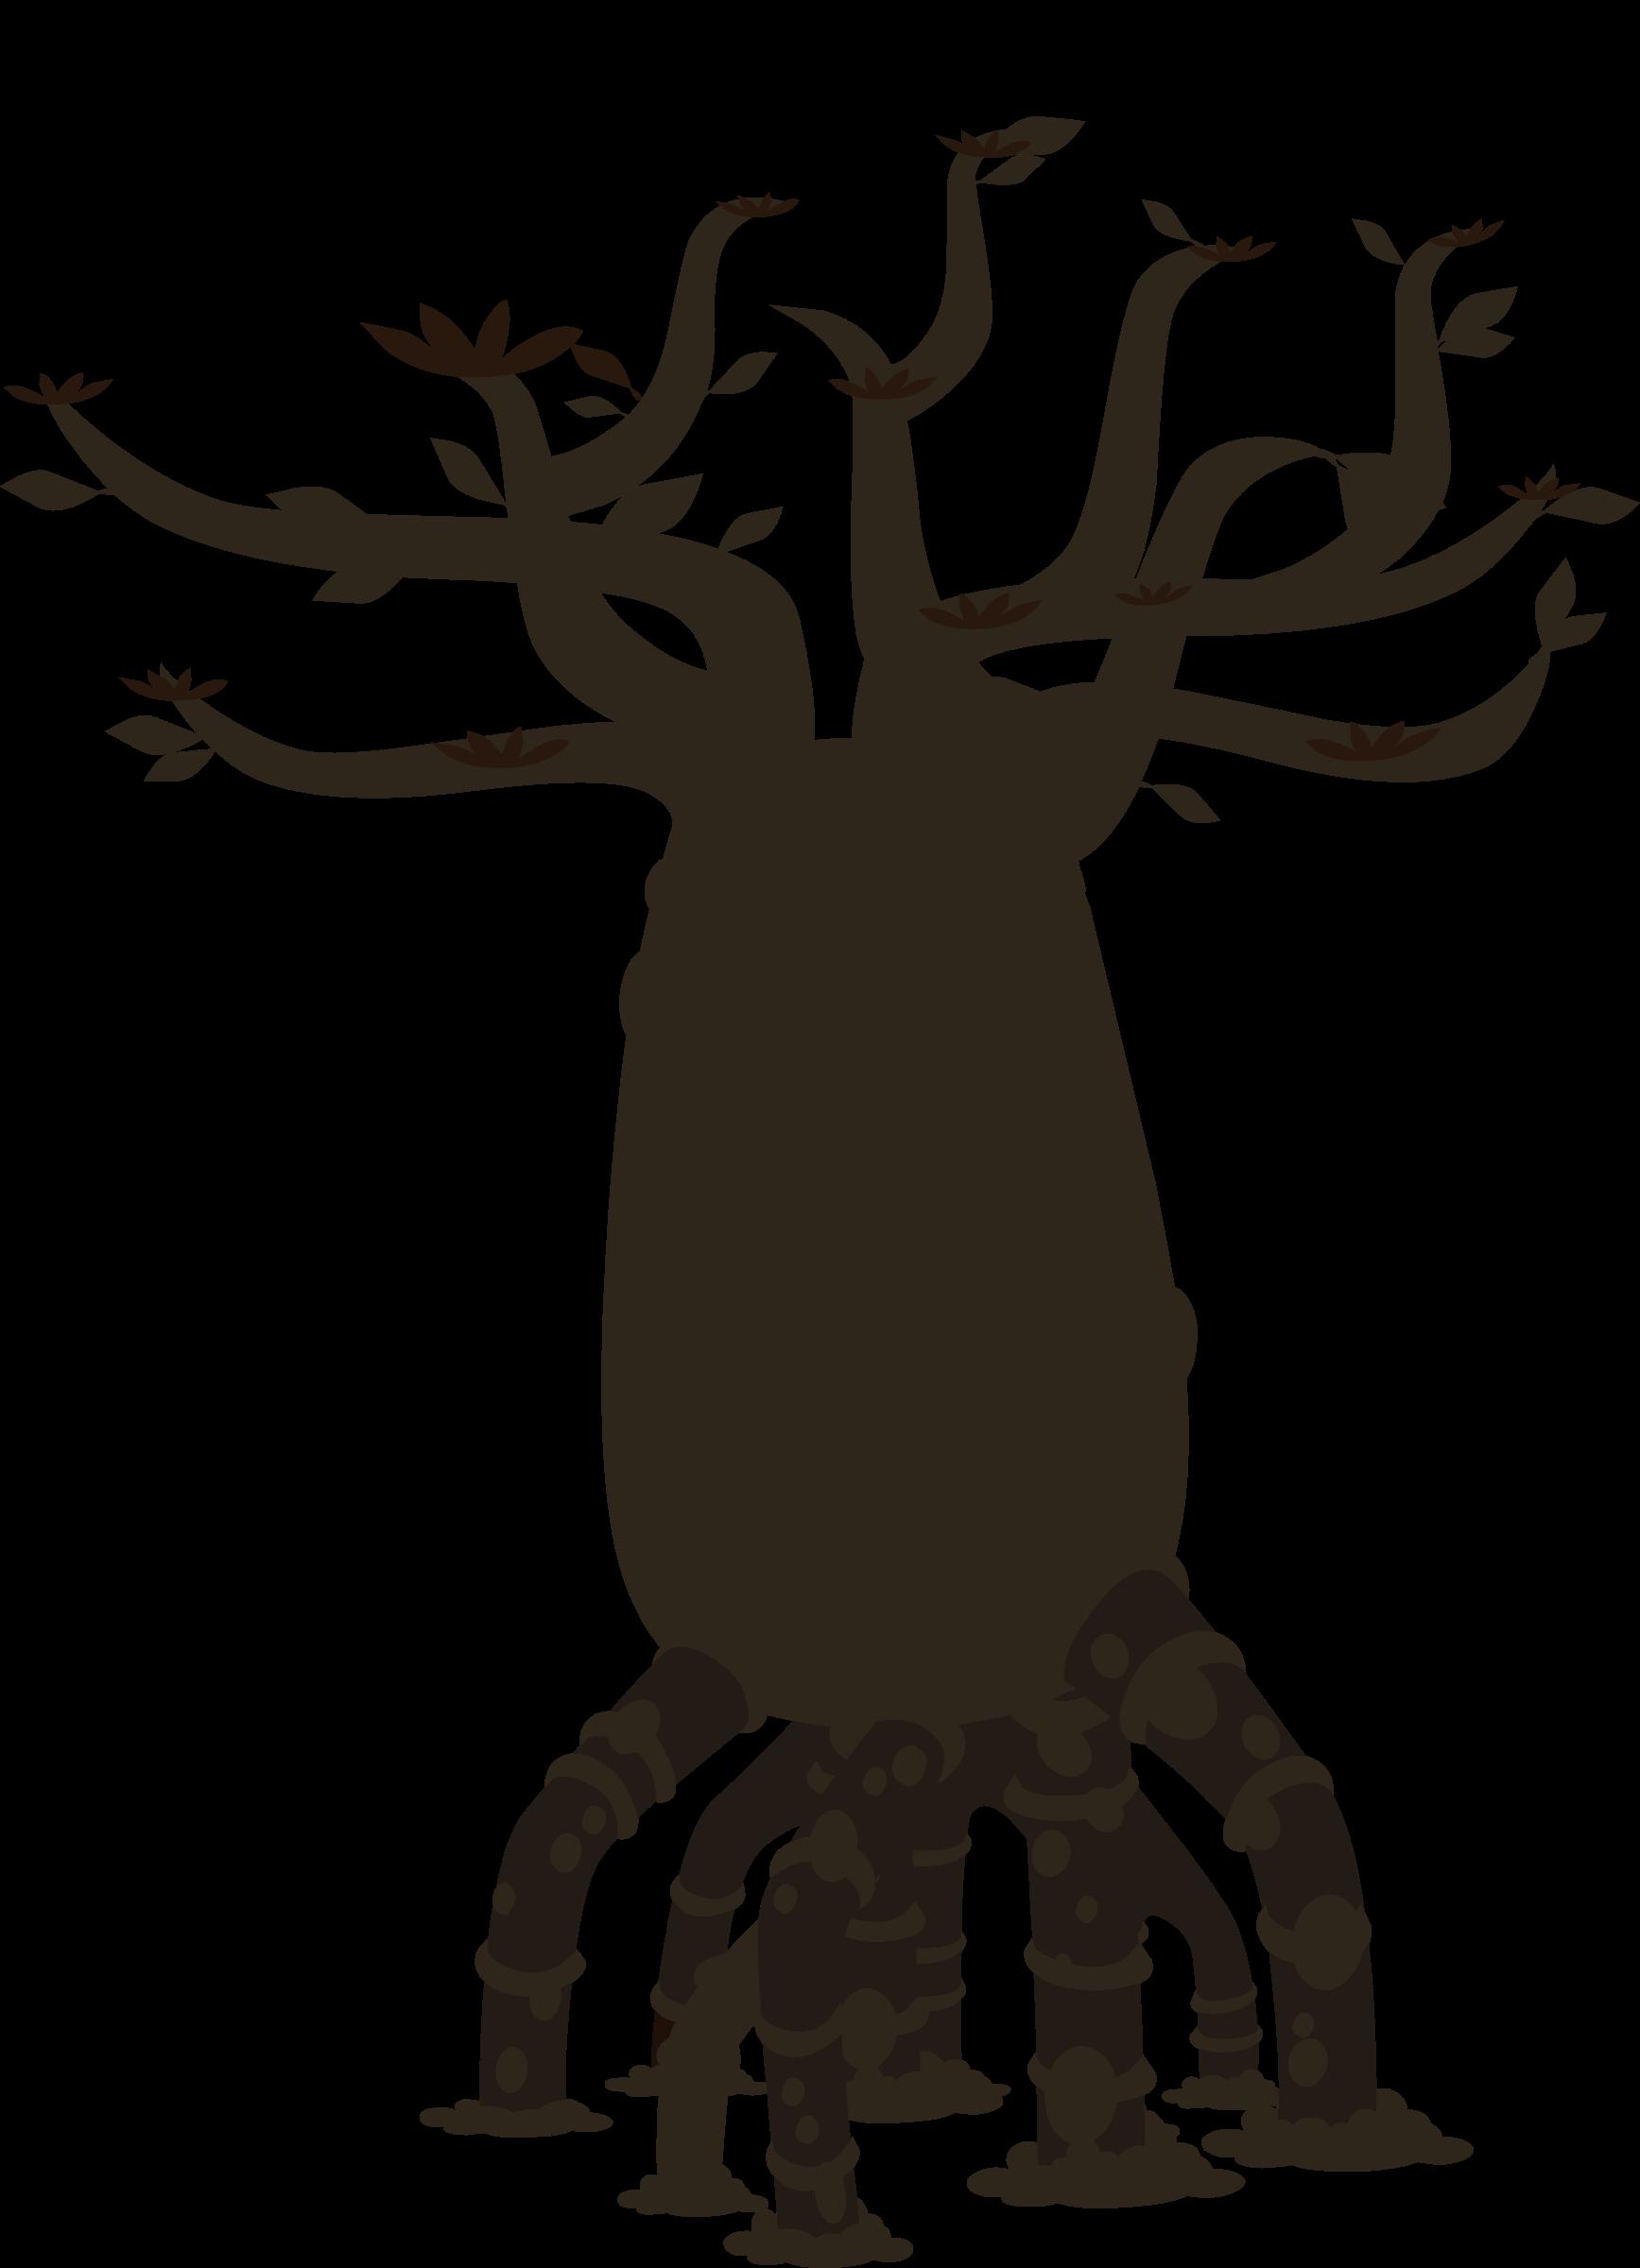 Glitch clipart silhouette Bottletree Background Clipart Firebog Bottletree